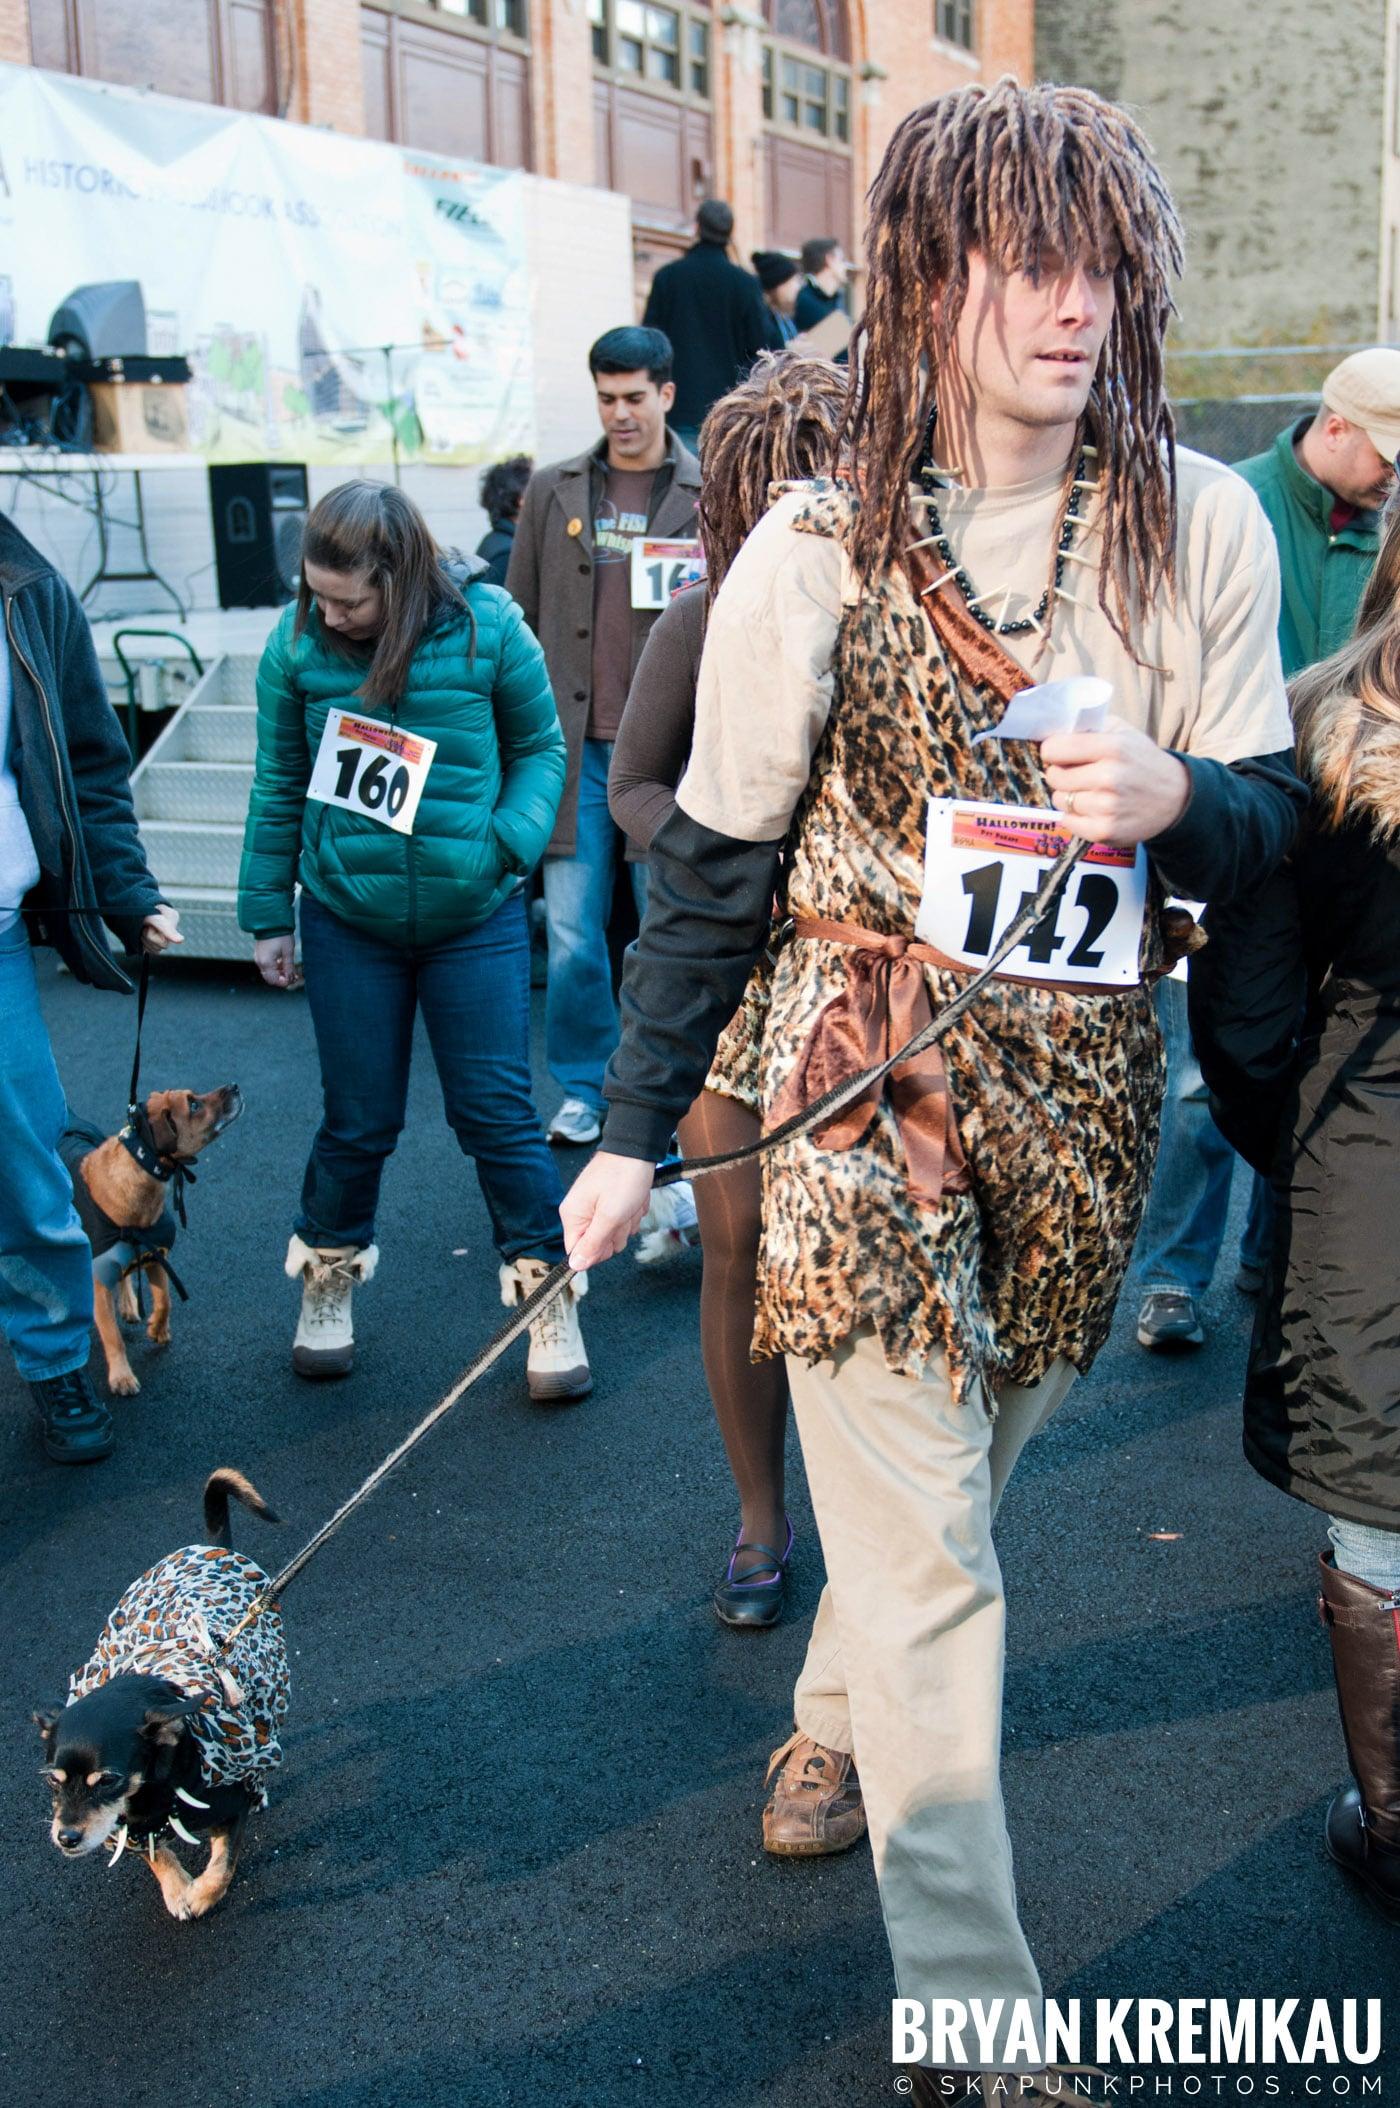 Paulus Hook Halloween Pet Parade 2011 @ Jersey City, NJ - 10.30.11 (36)